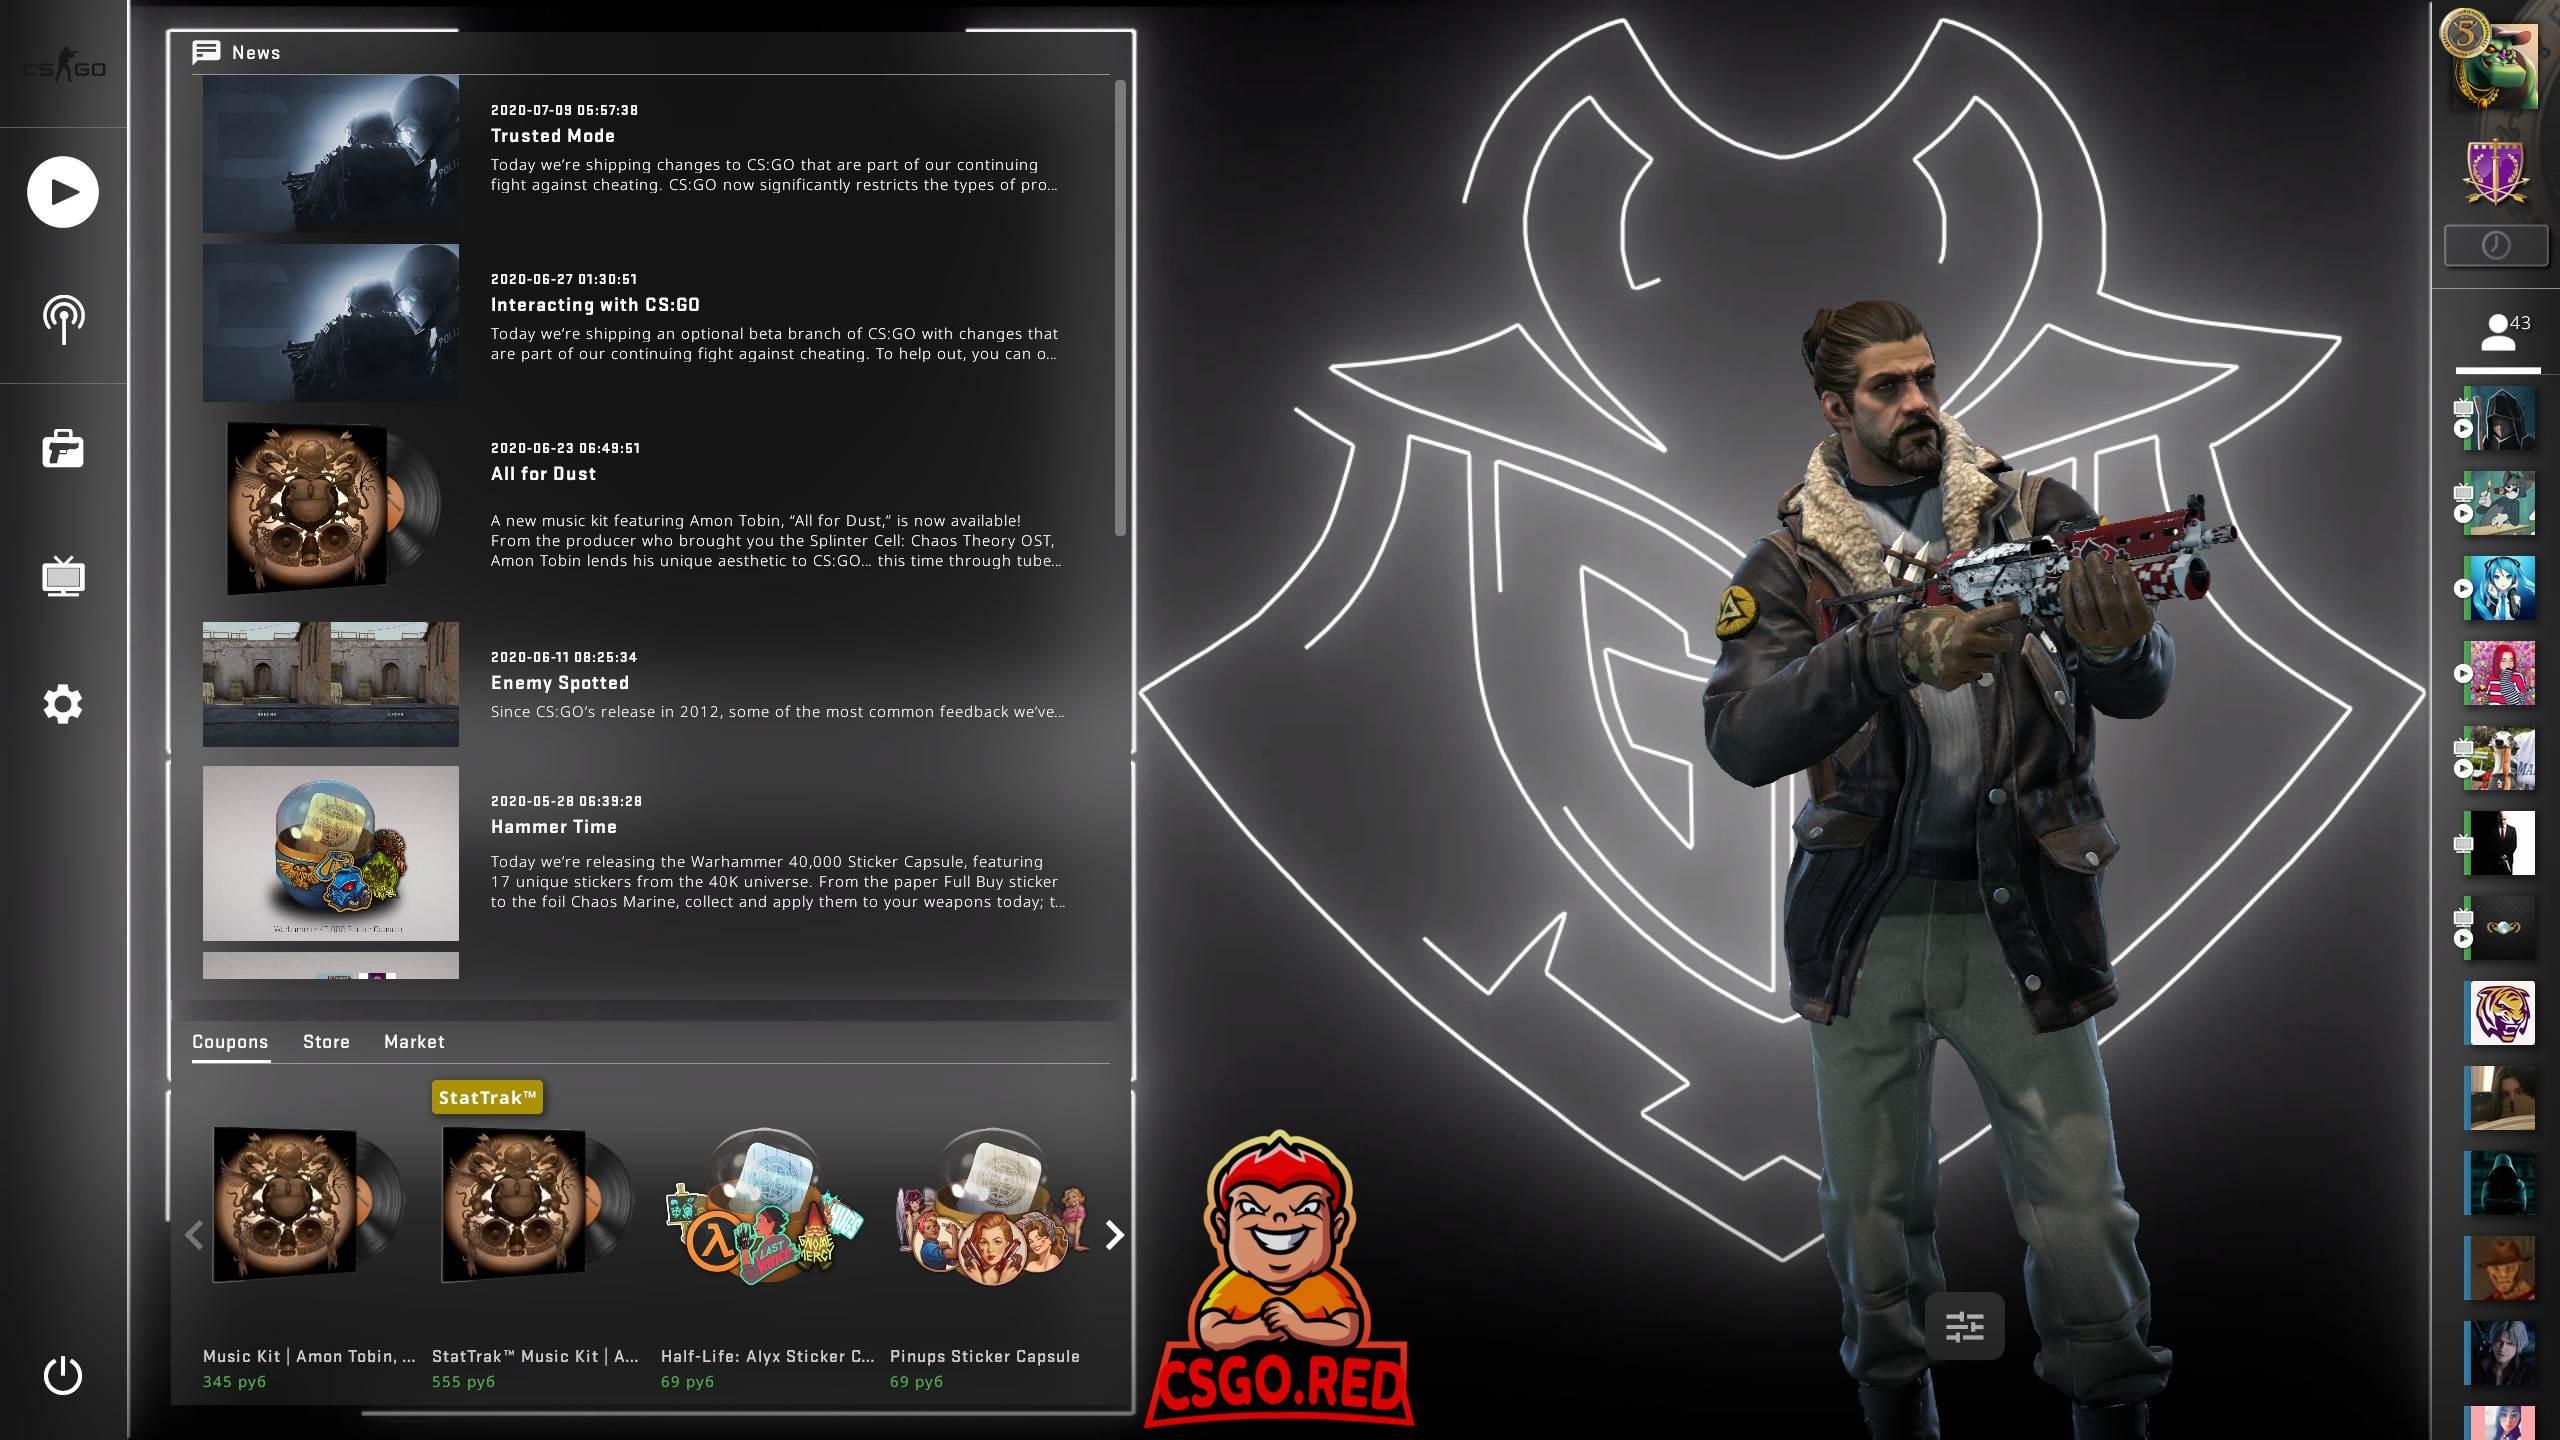 G2 Animated Panorama UI Background